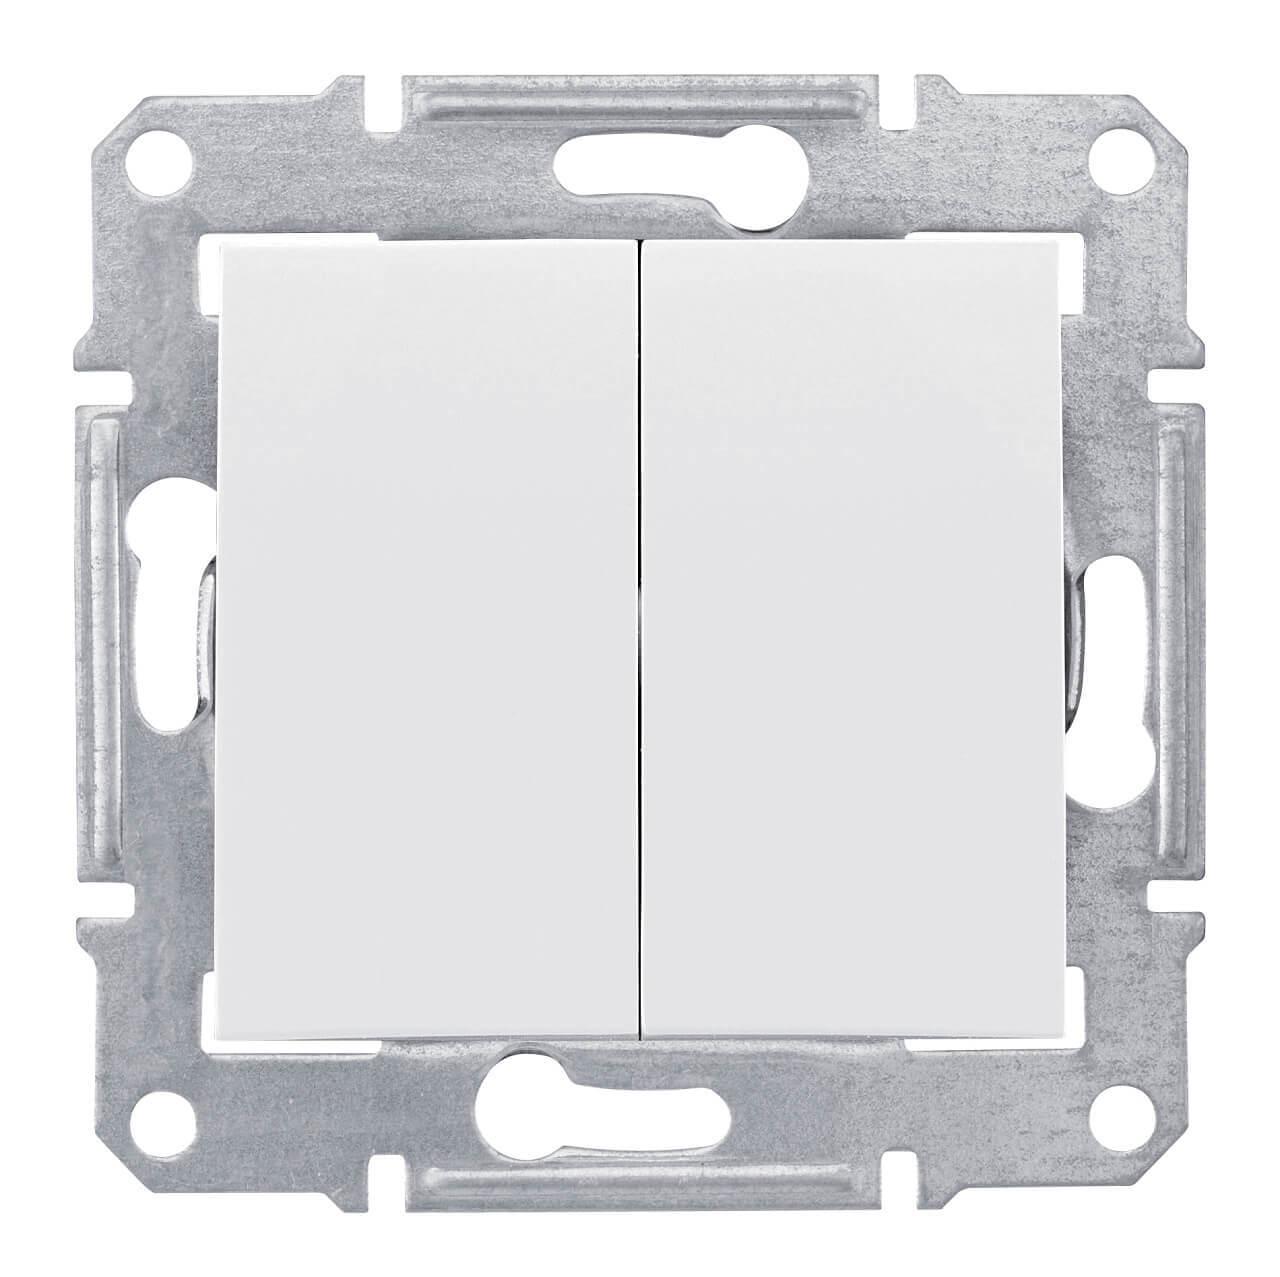 Выключатель двухклавишный Schneider Electric Sedna 10A 250V SDN0300121 выключатель двухклавишный с синей подсветкой sedna 10a 250v schneider electric 1265855